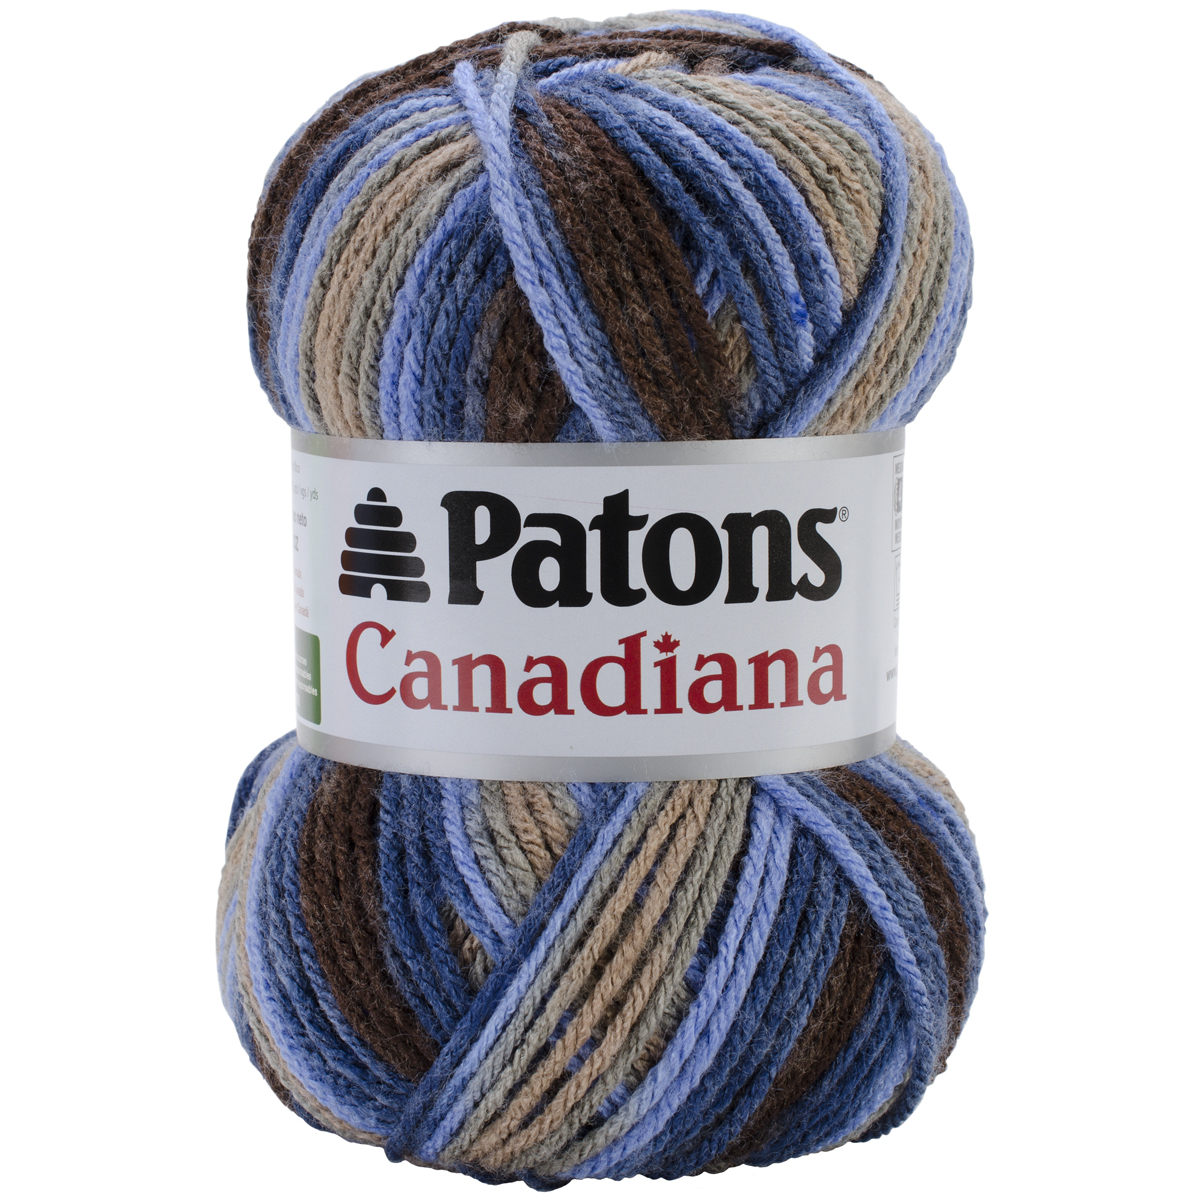 Canadiana Yarn - Ombres-Wedgewood